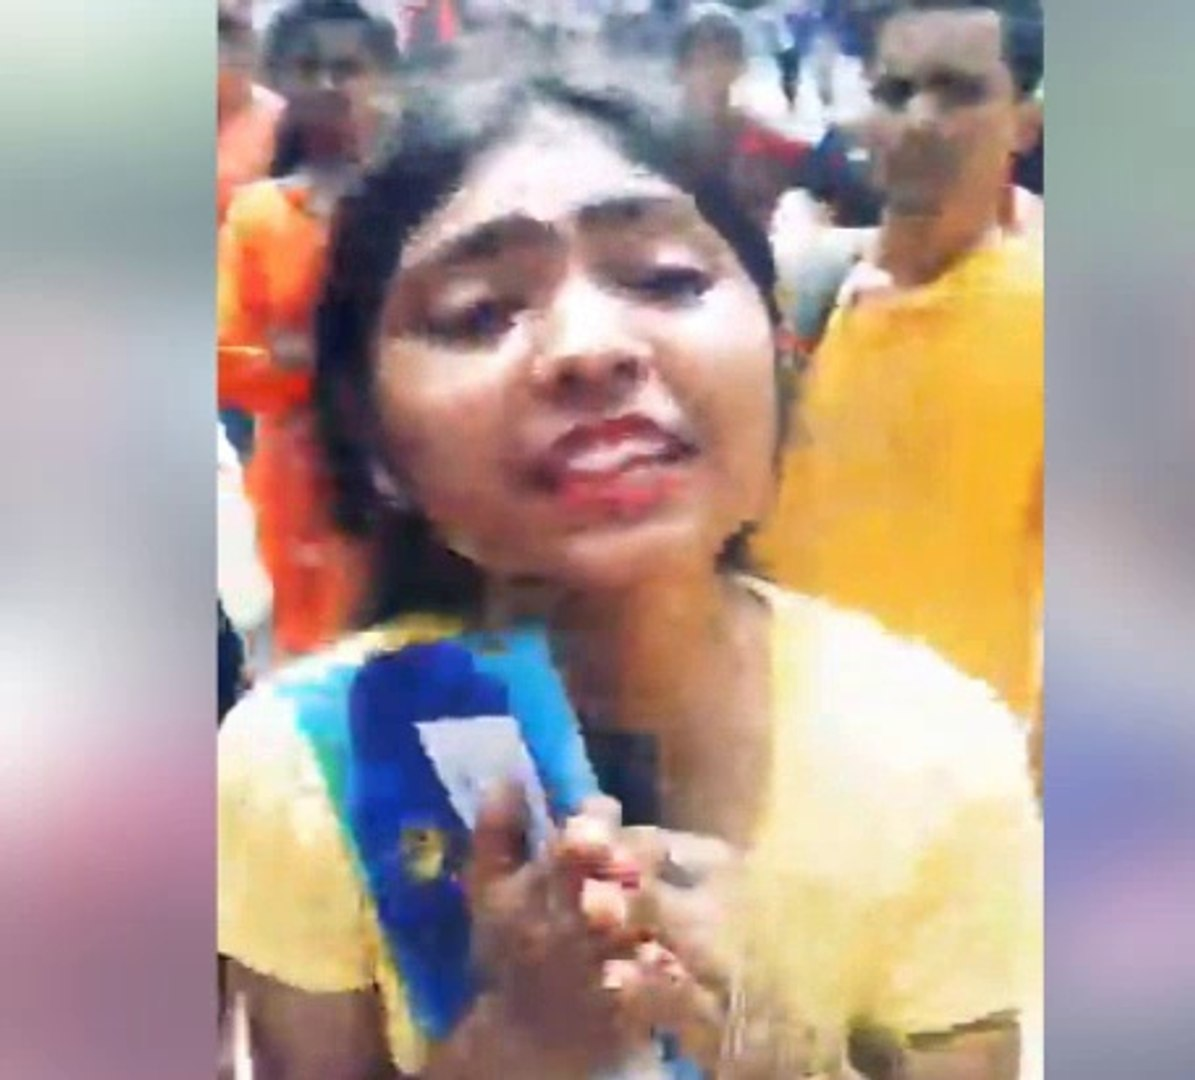 INDIAN IDOL EXPOSE ON MUMBAI AUDITION Ye Hai Indian Idol Ki Sacchai Aap khud Dekhain Plzzz Share to